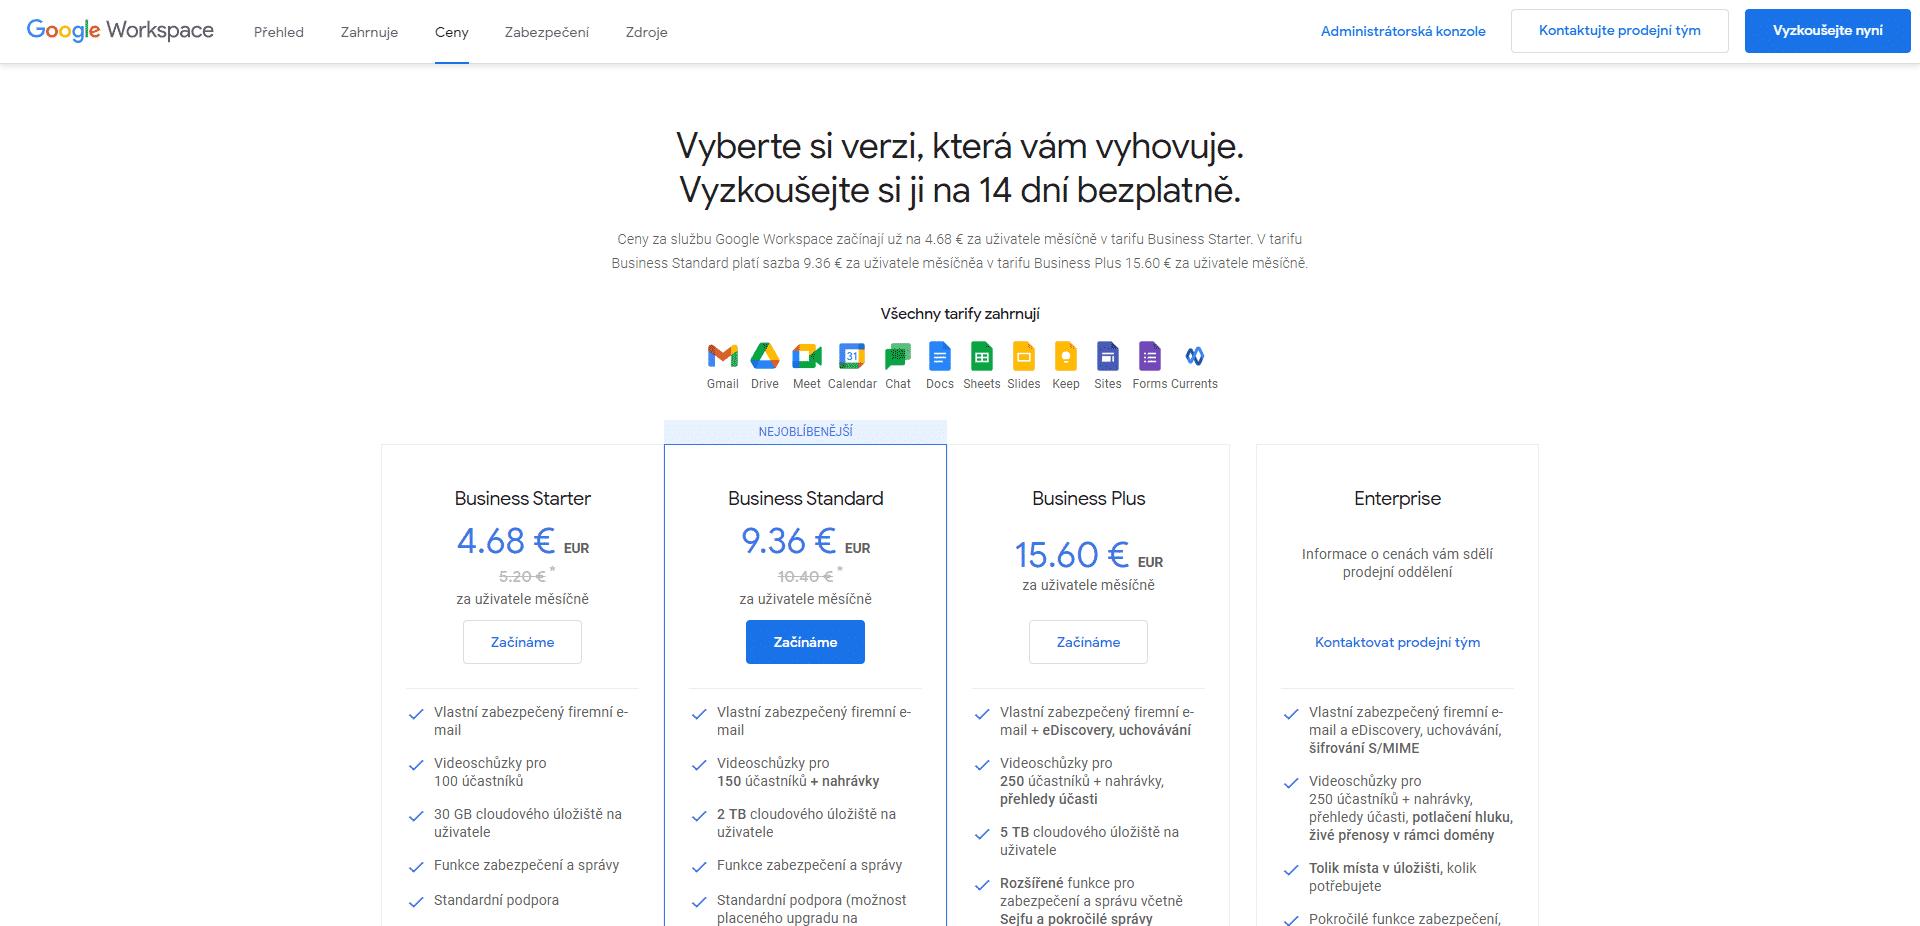 Ceník Google Workspace, 26. 01. 2021